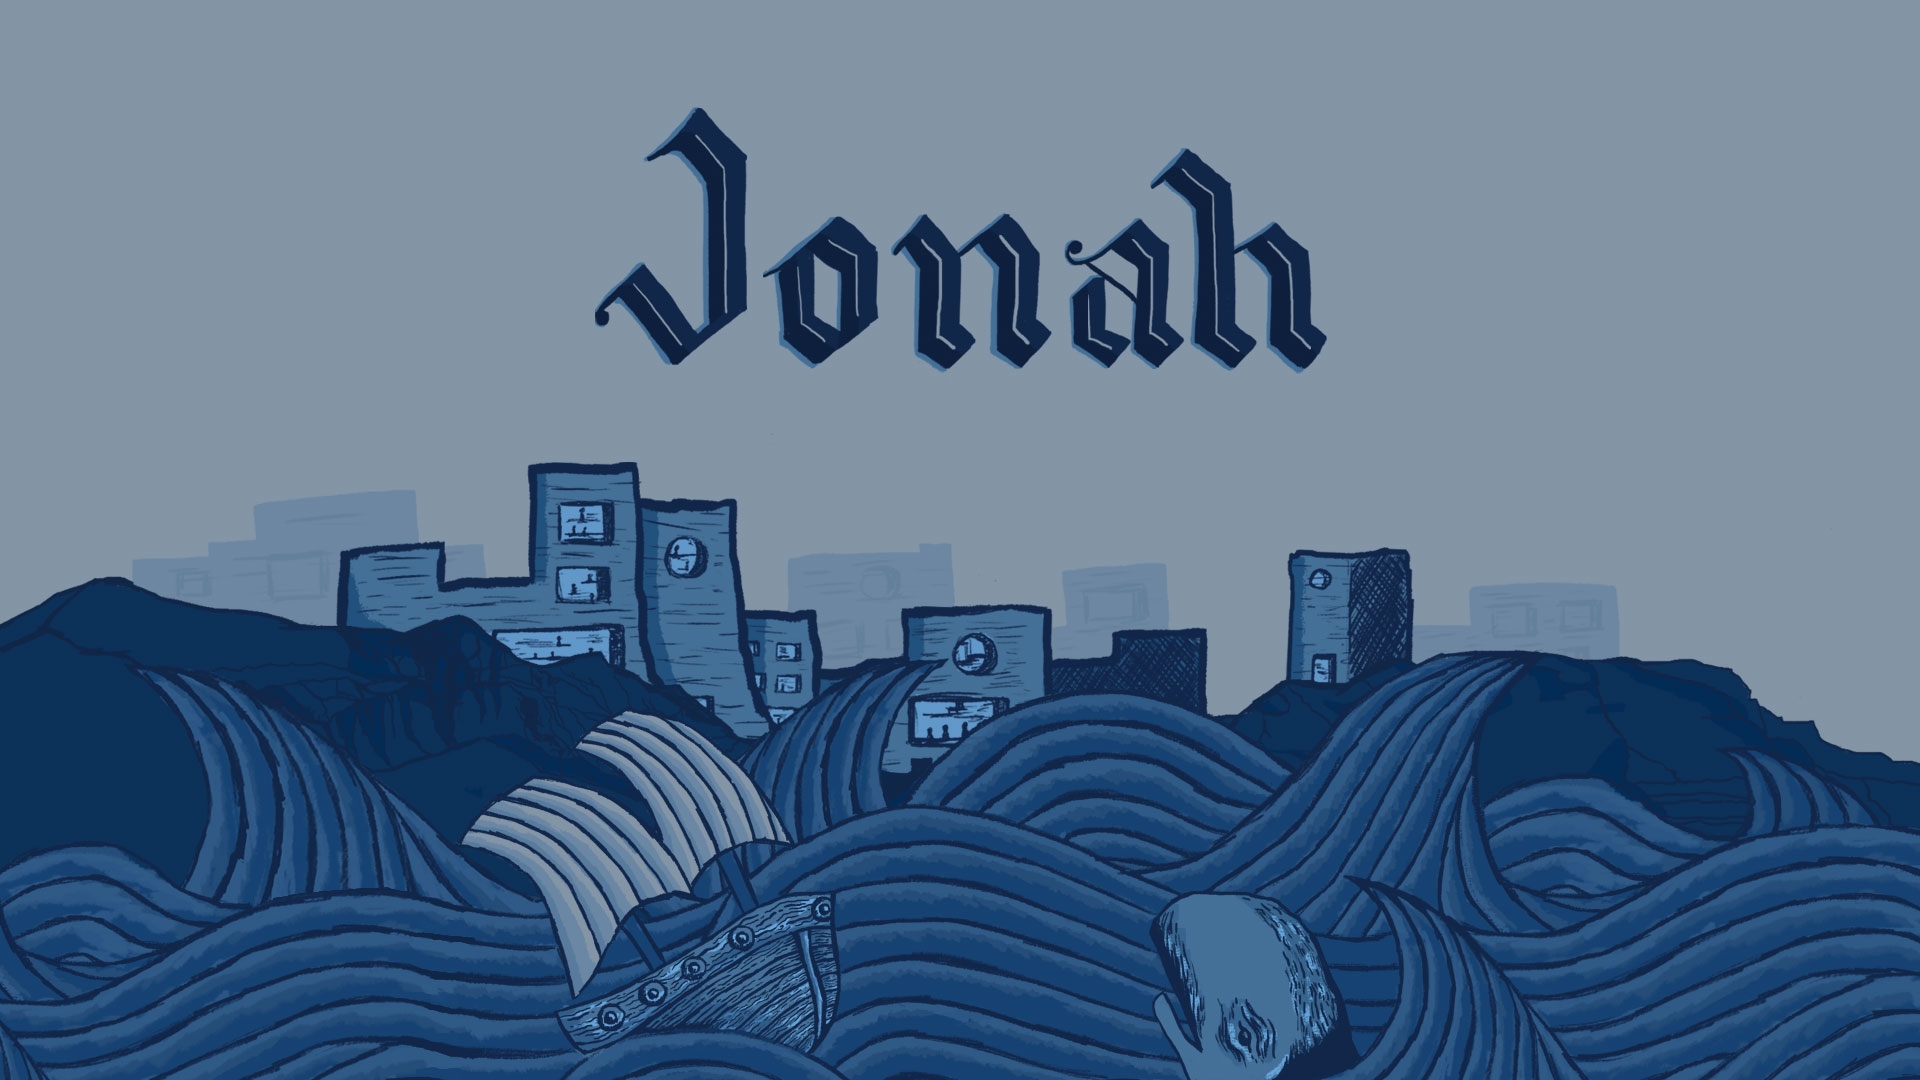 jonah-title-only.jpg